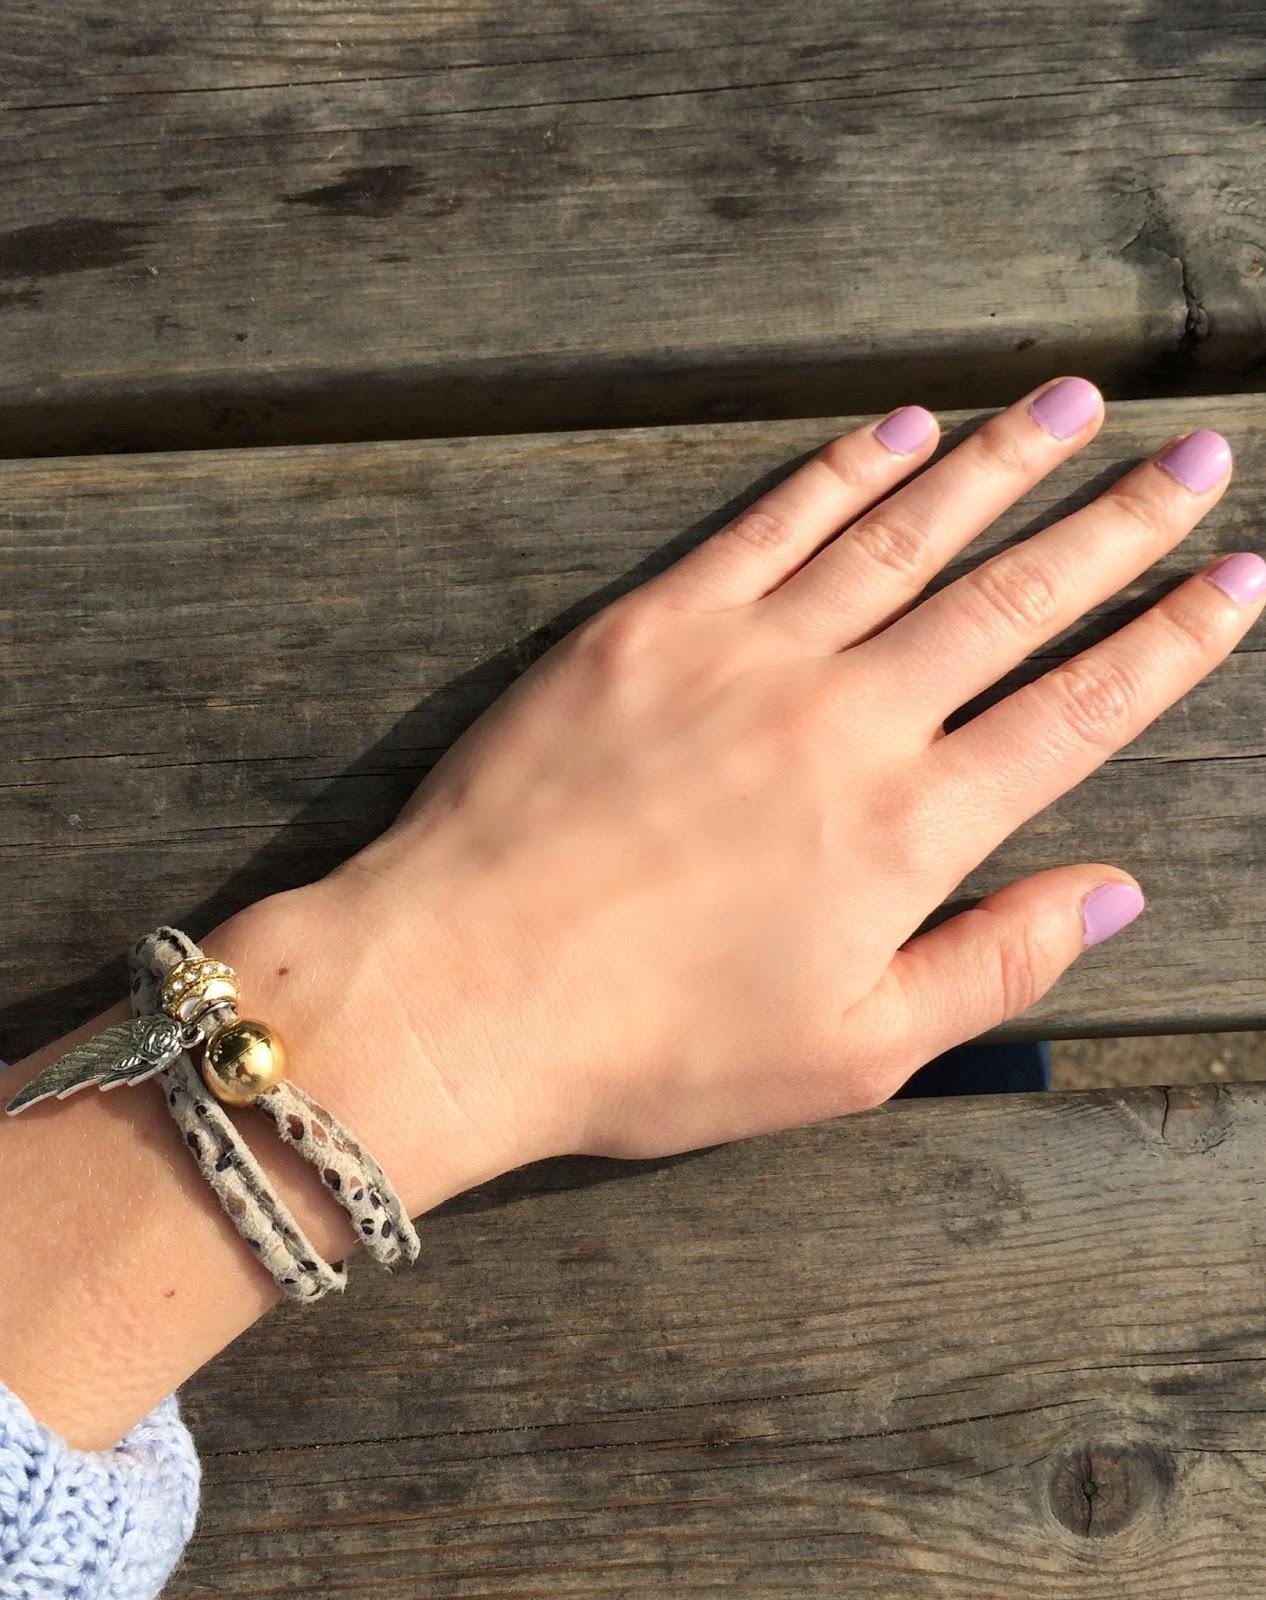 lavender nail polish, ciate london, ciate london nail polish lavender